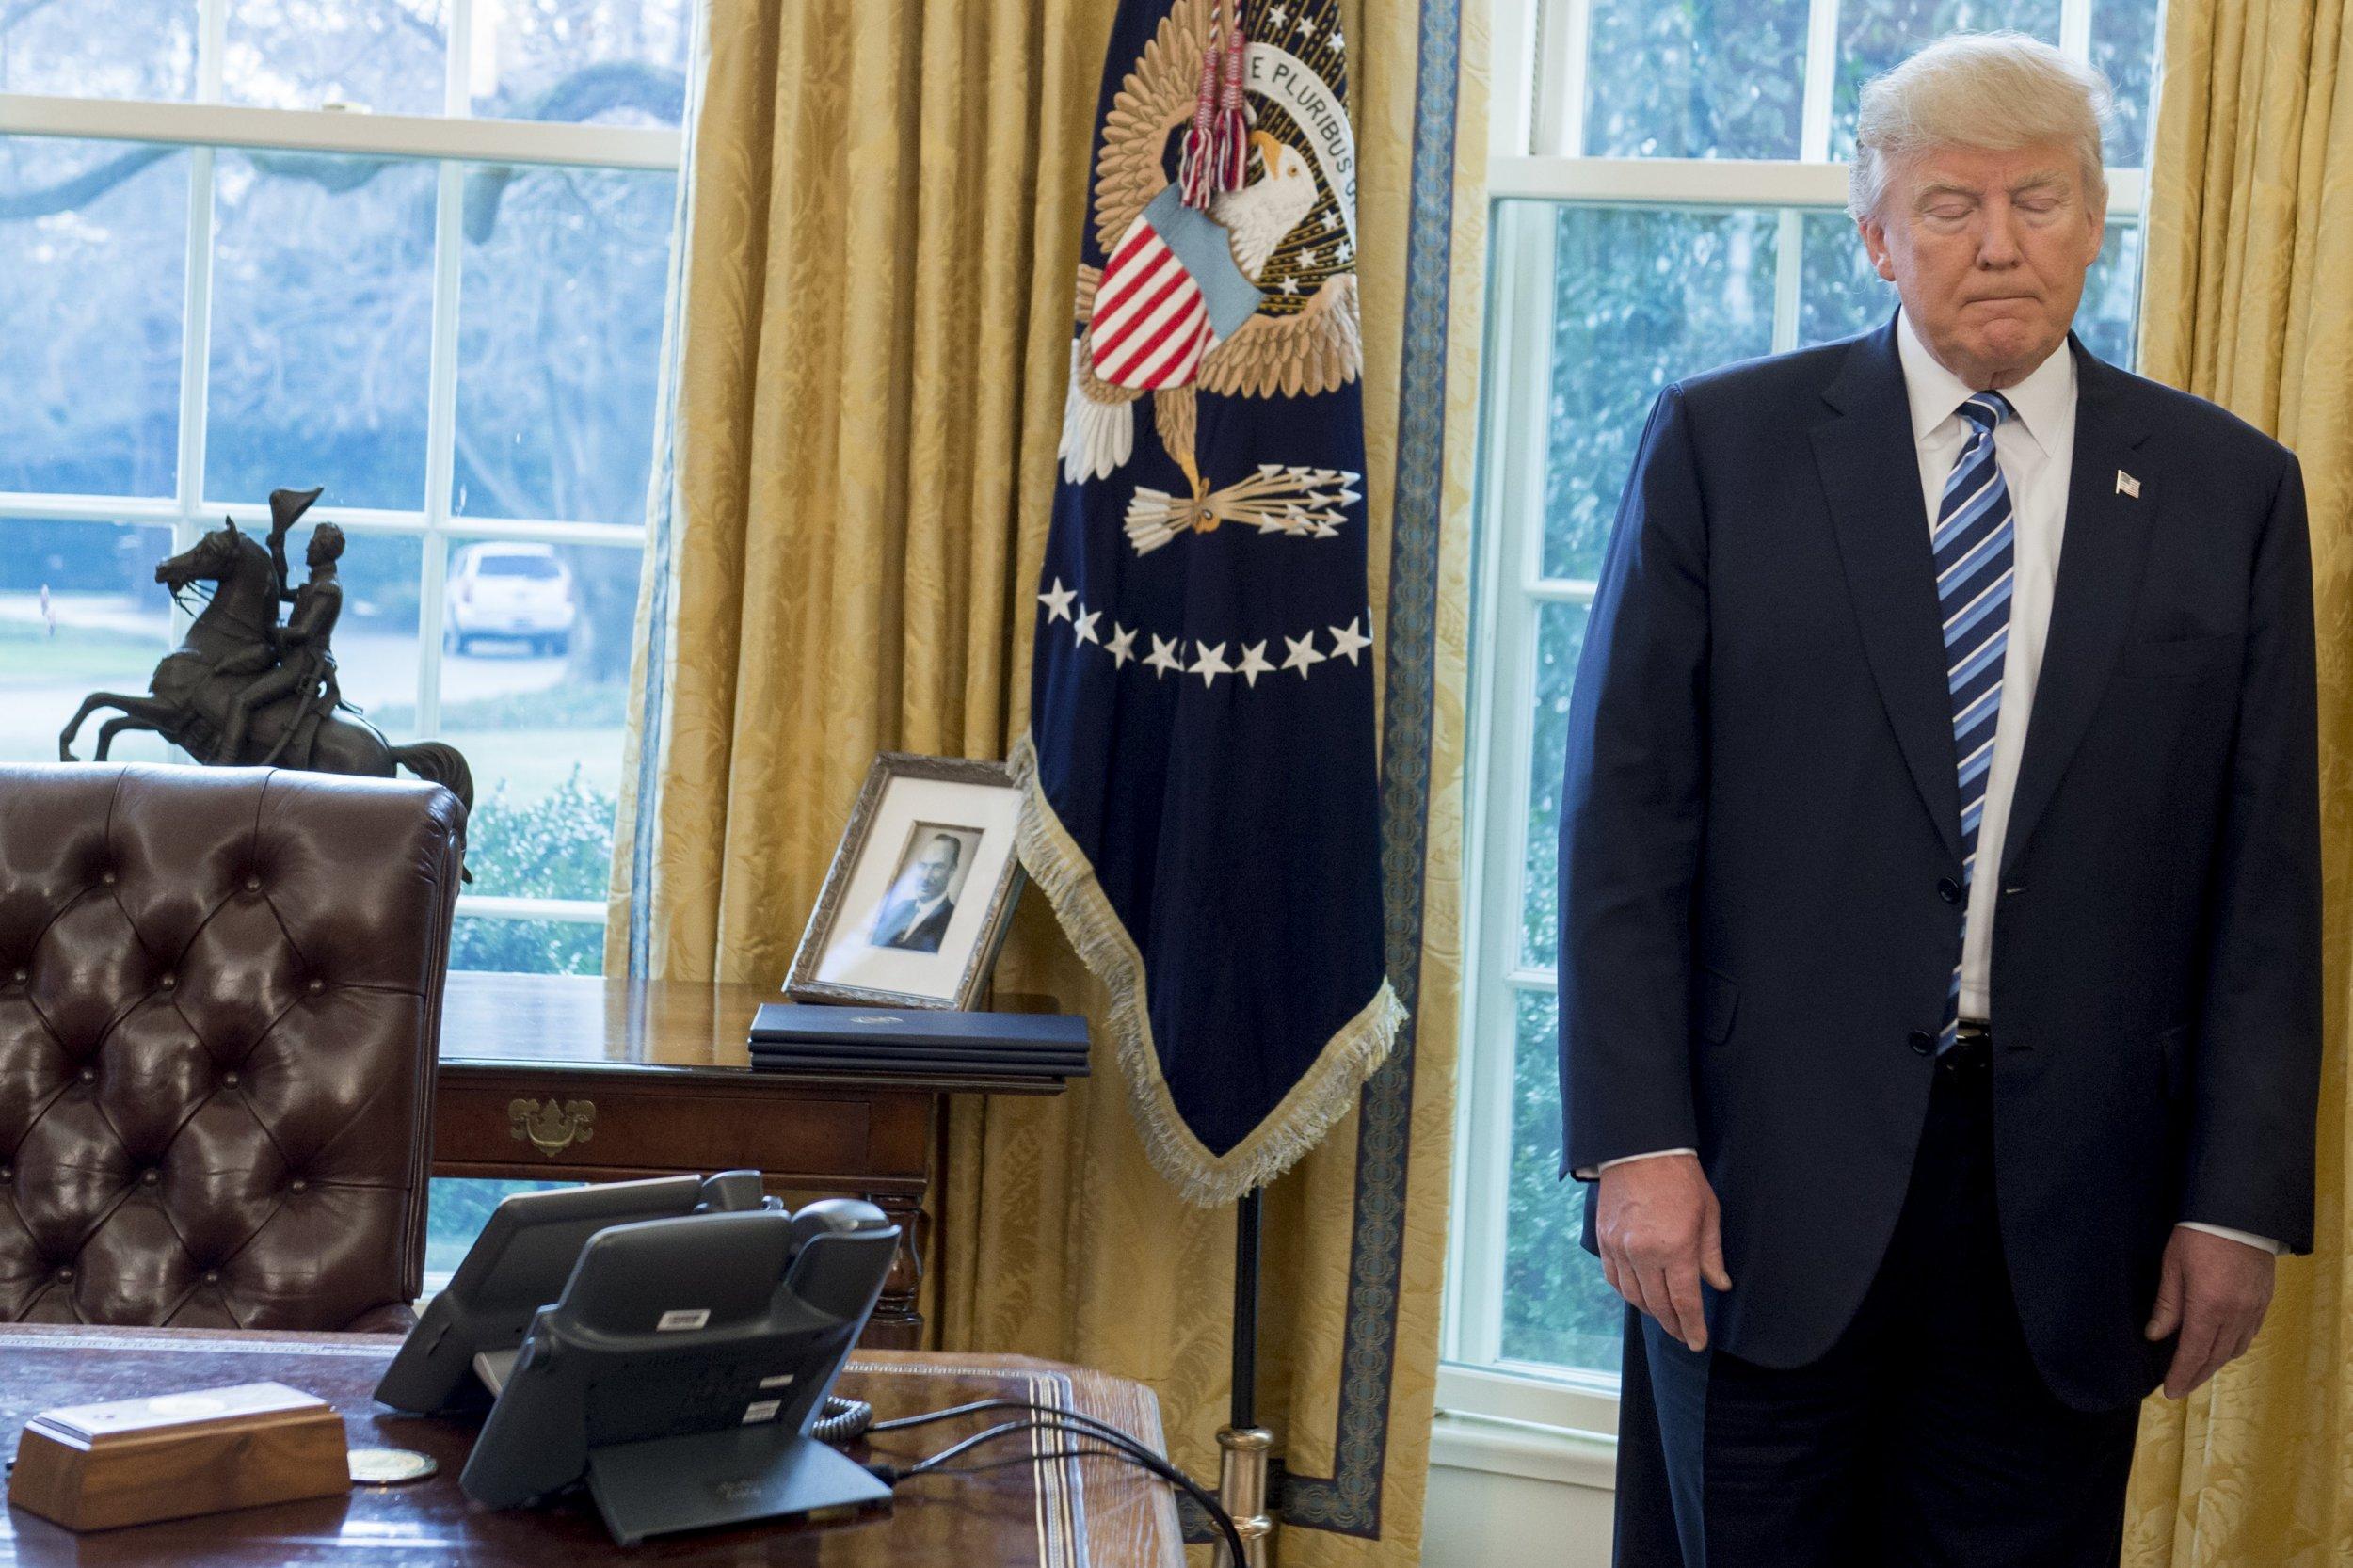 donald, trump, schedule, twitter, pence, intelligence